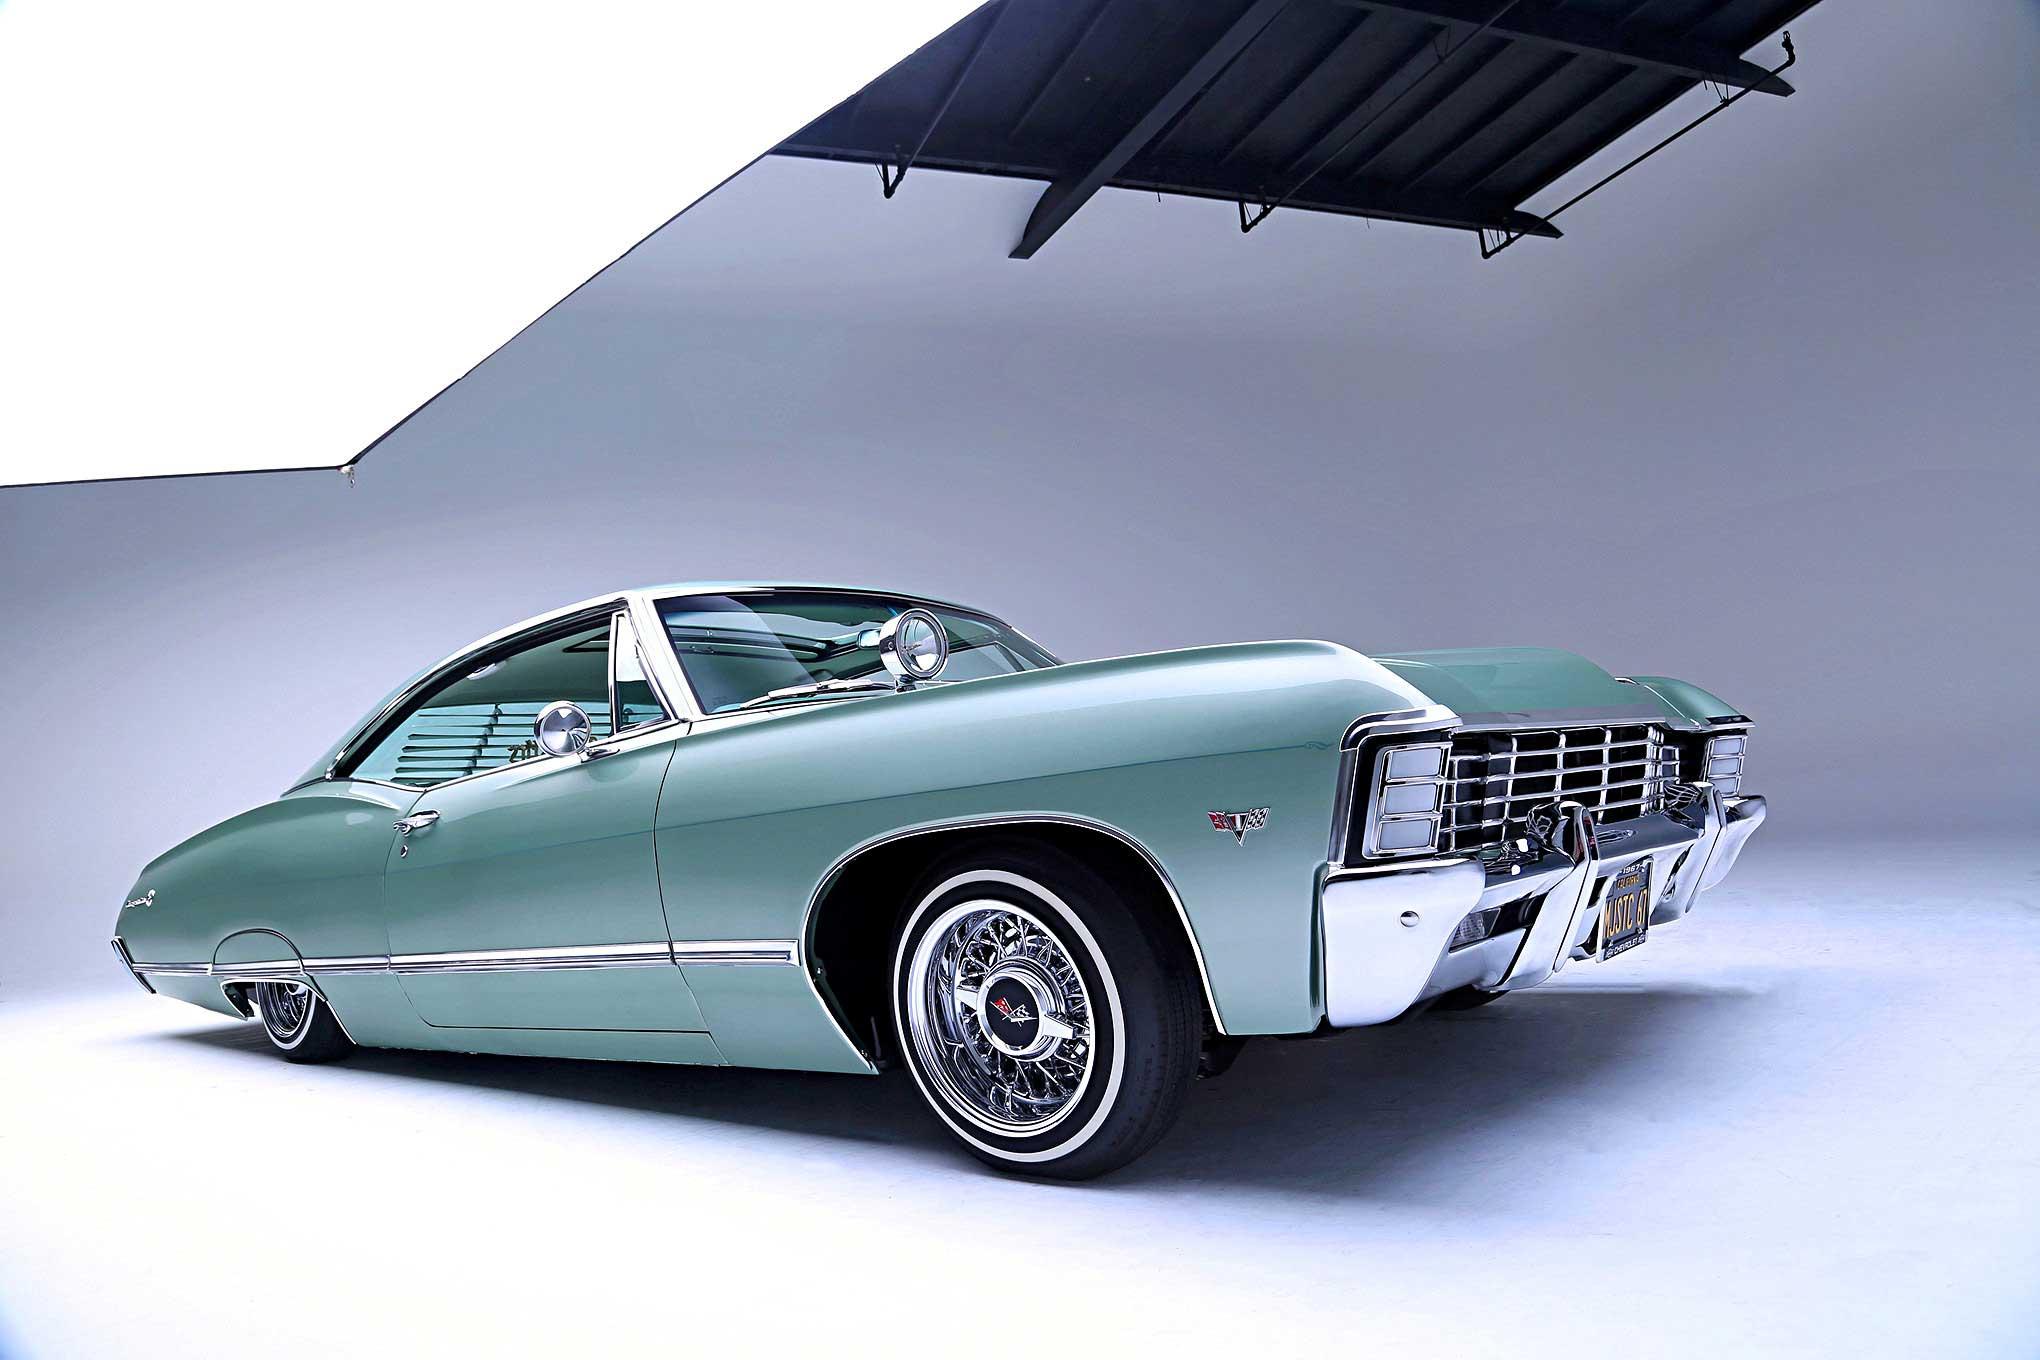 1967 Chevrolet Impala Left Hand Mirror Chrome Complete